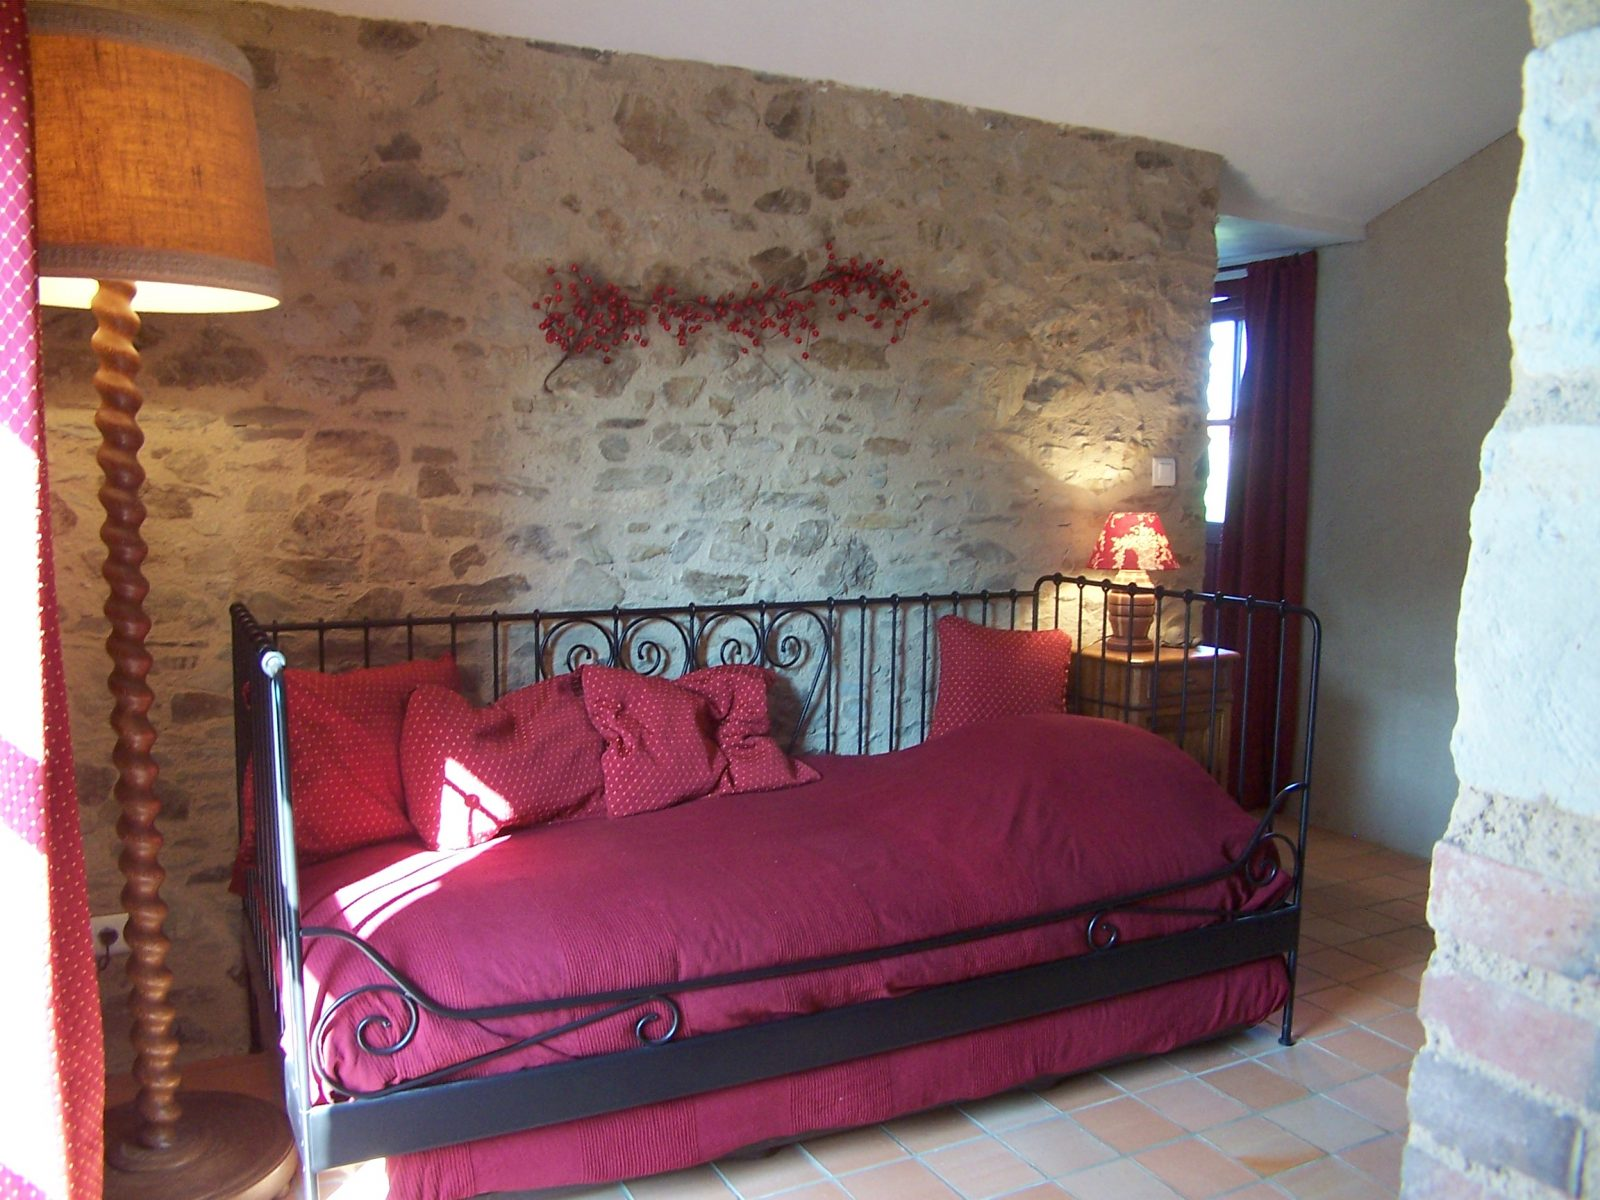 2017-chambres-hotes-ecorce10-vieillevigne-44-levignobledenantes-tourisme